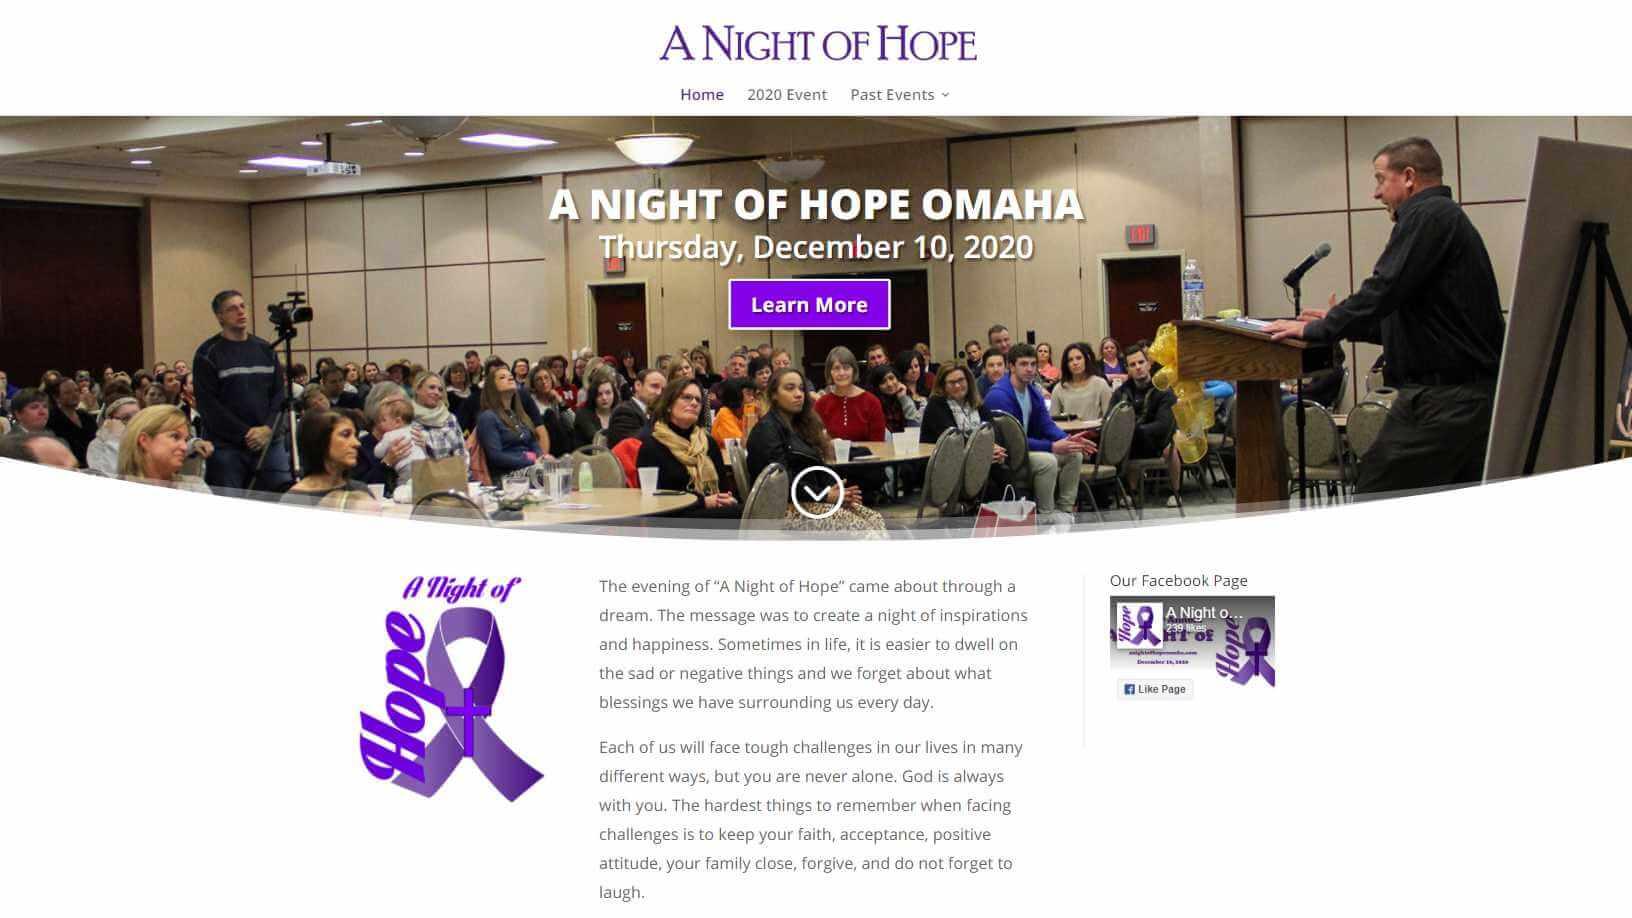 A Night of Hope Omaha